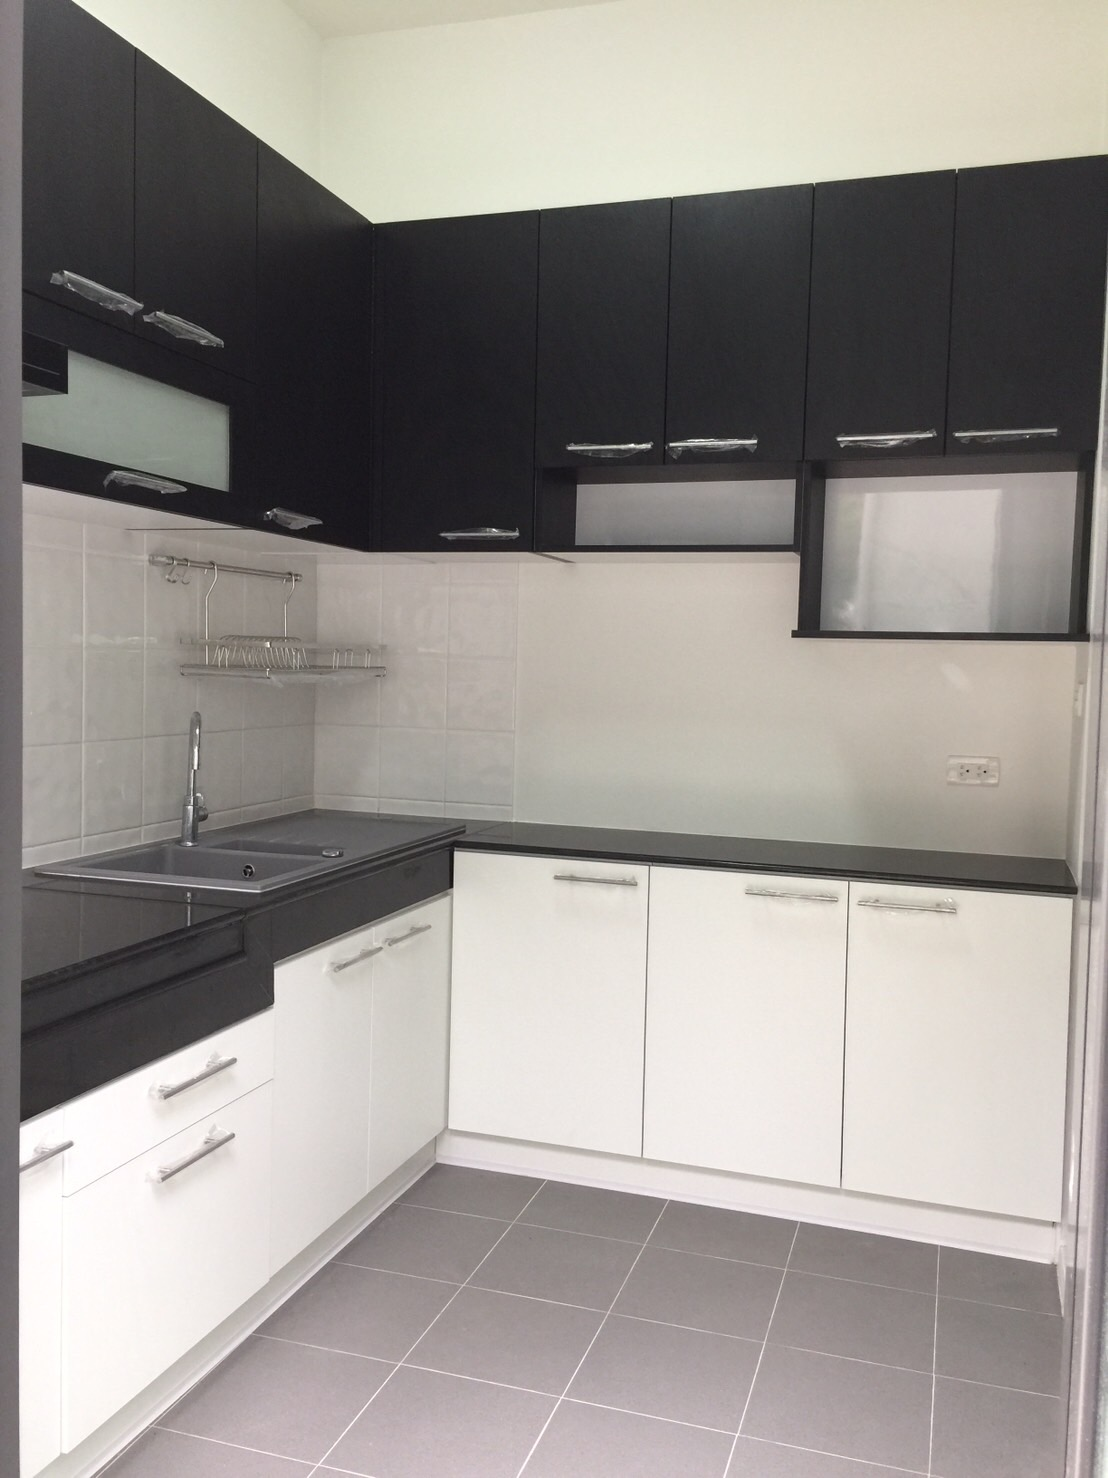 Black & White Kitchen (ครัวบิ้วอินทับโครงปูนหน้าบานสีขาว)